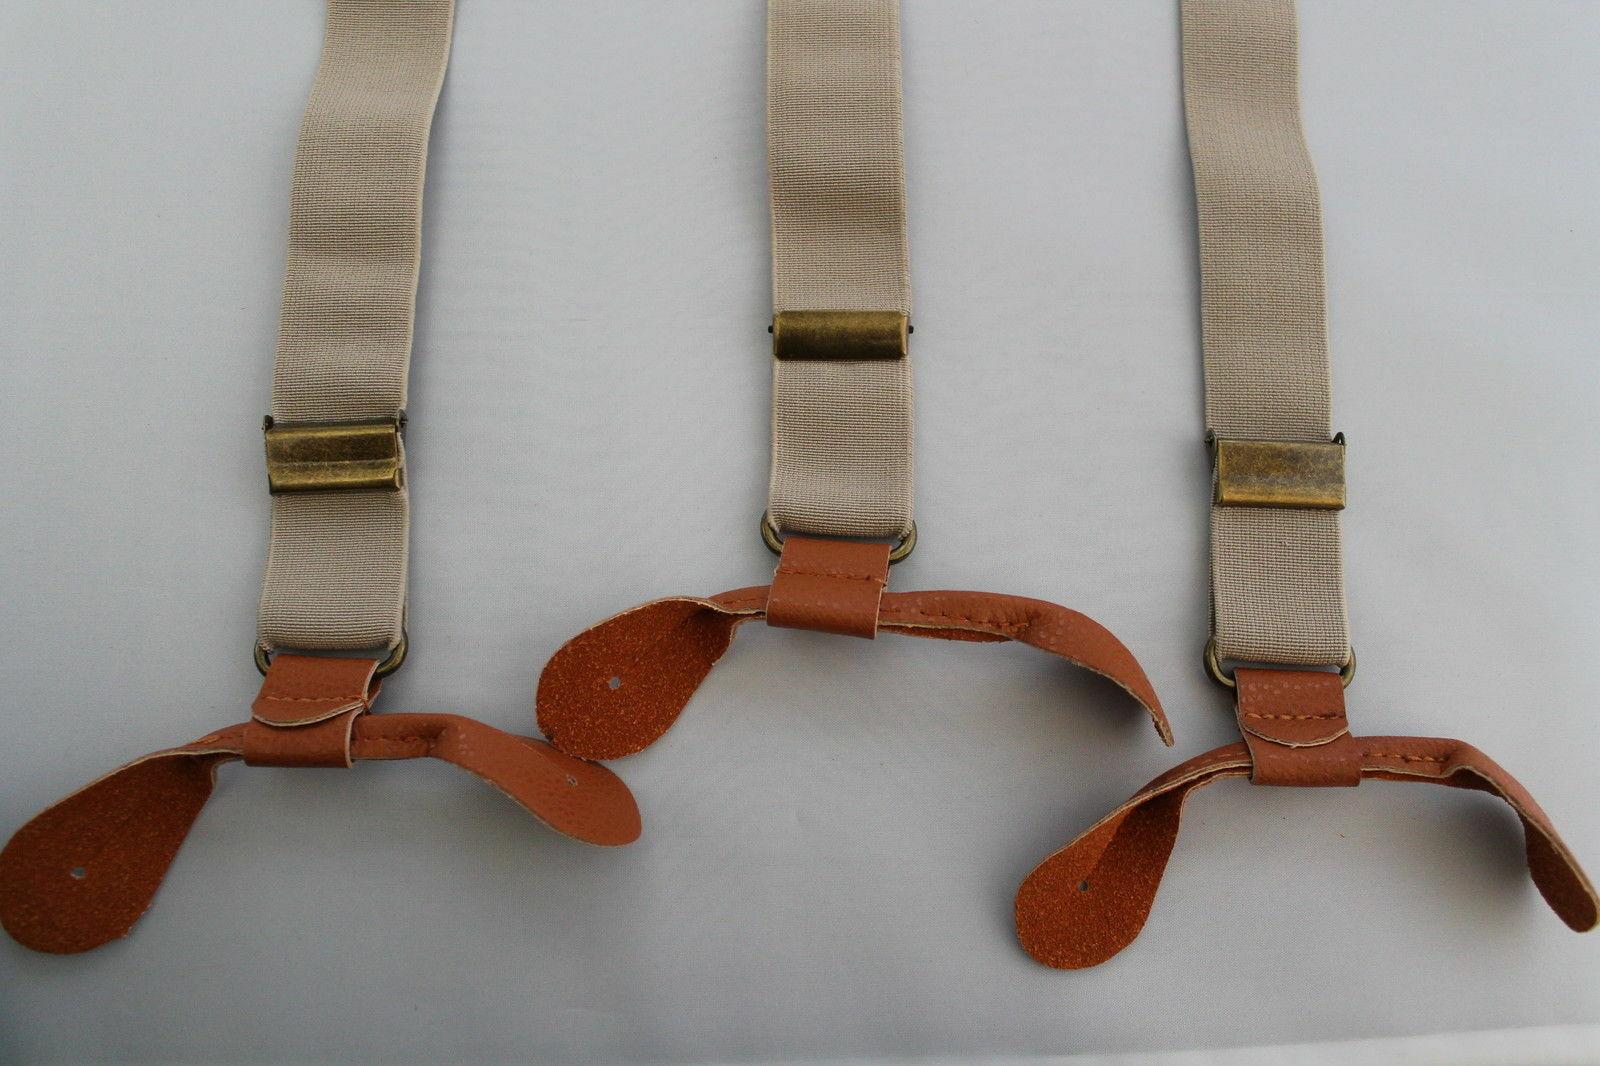 Beige Unisex Suspender Braces Adjustable Leather Button Holes Lycra/Elastane UK image 4